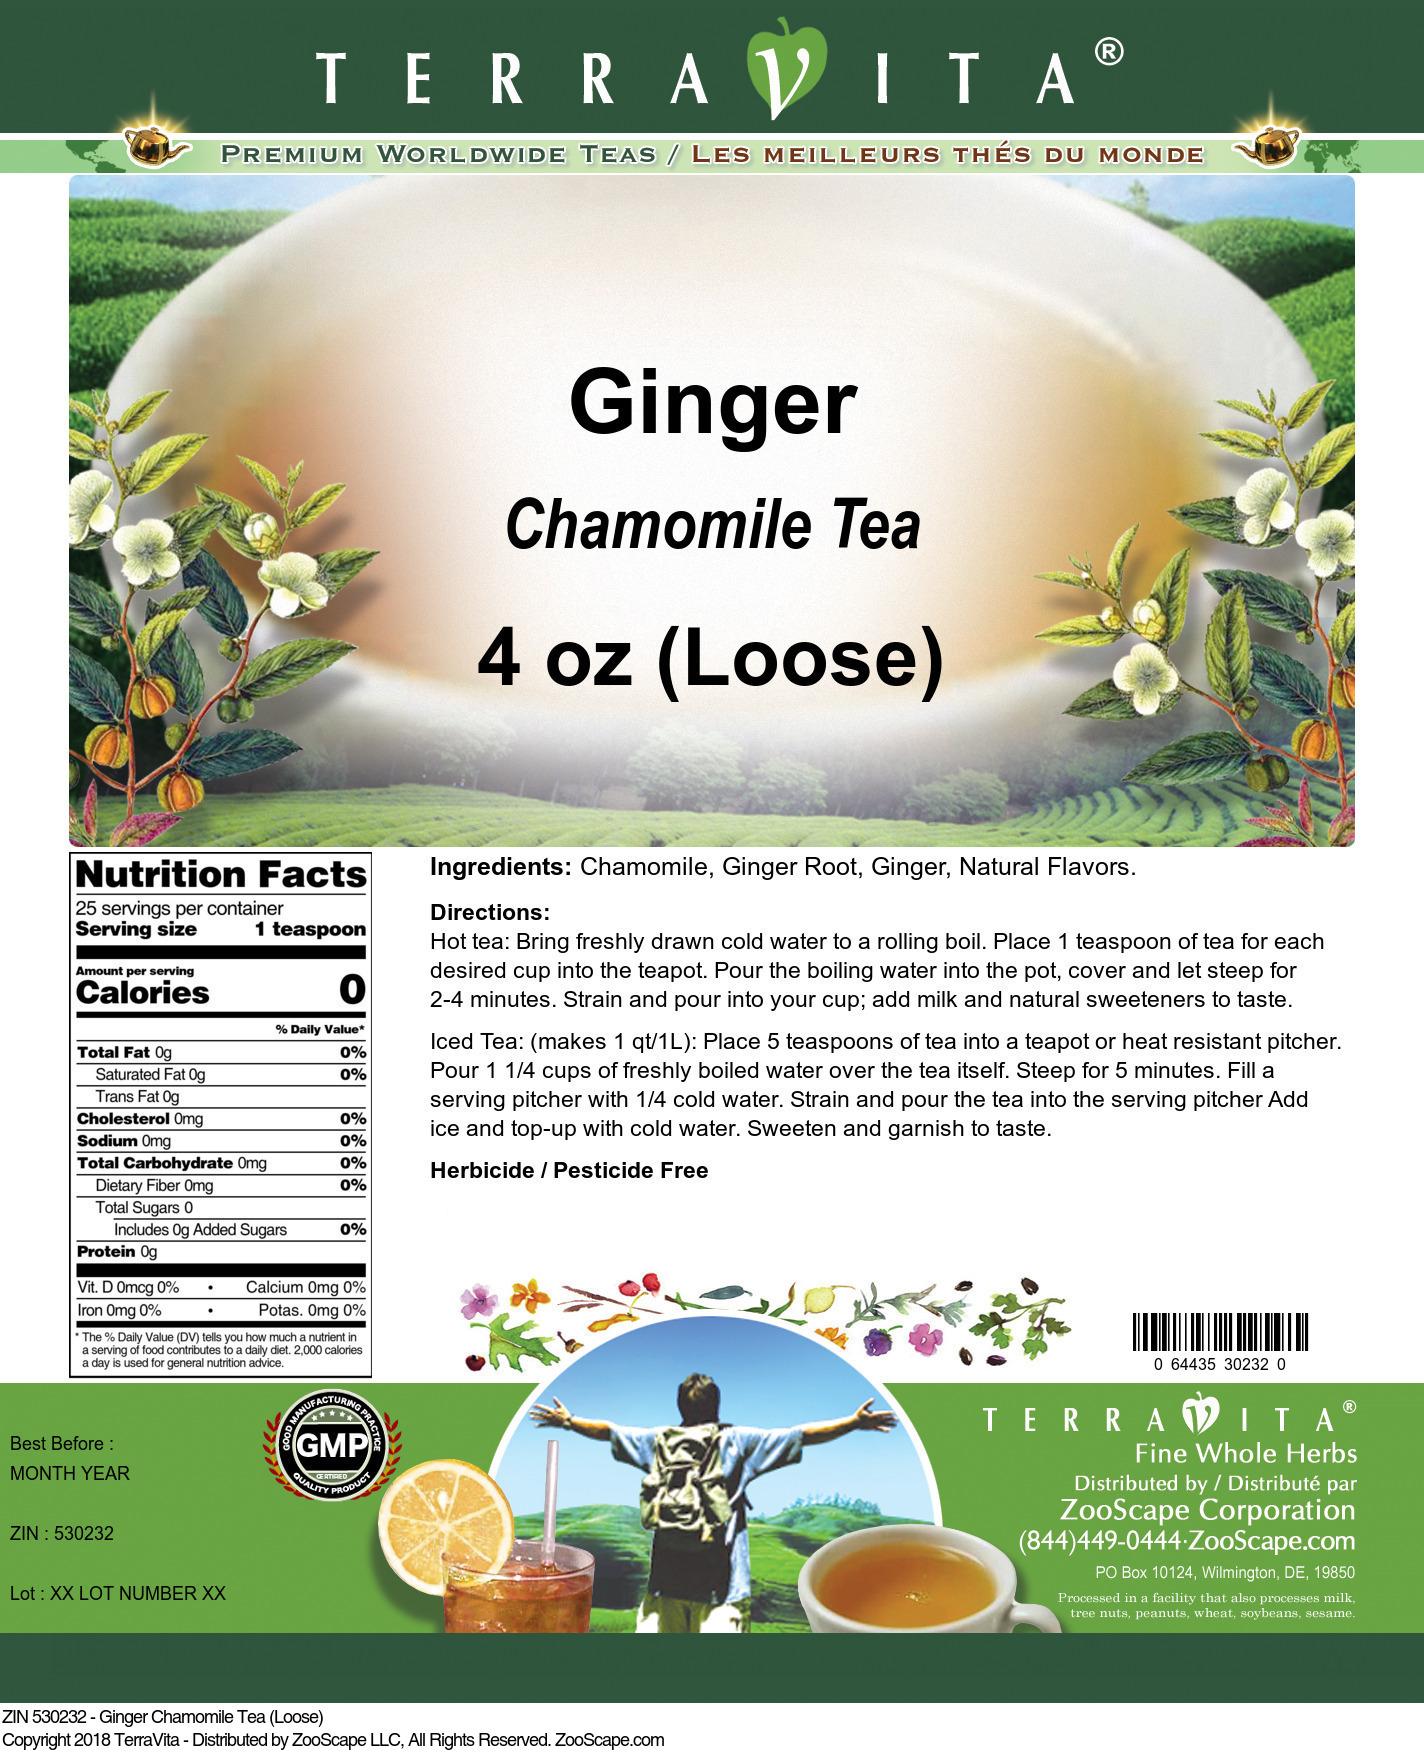 Ginger Chamomile Tea (Loose)